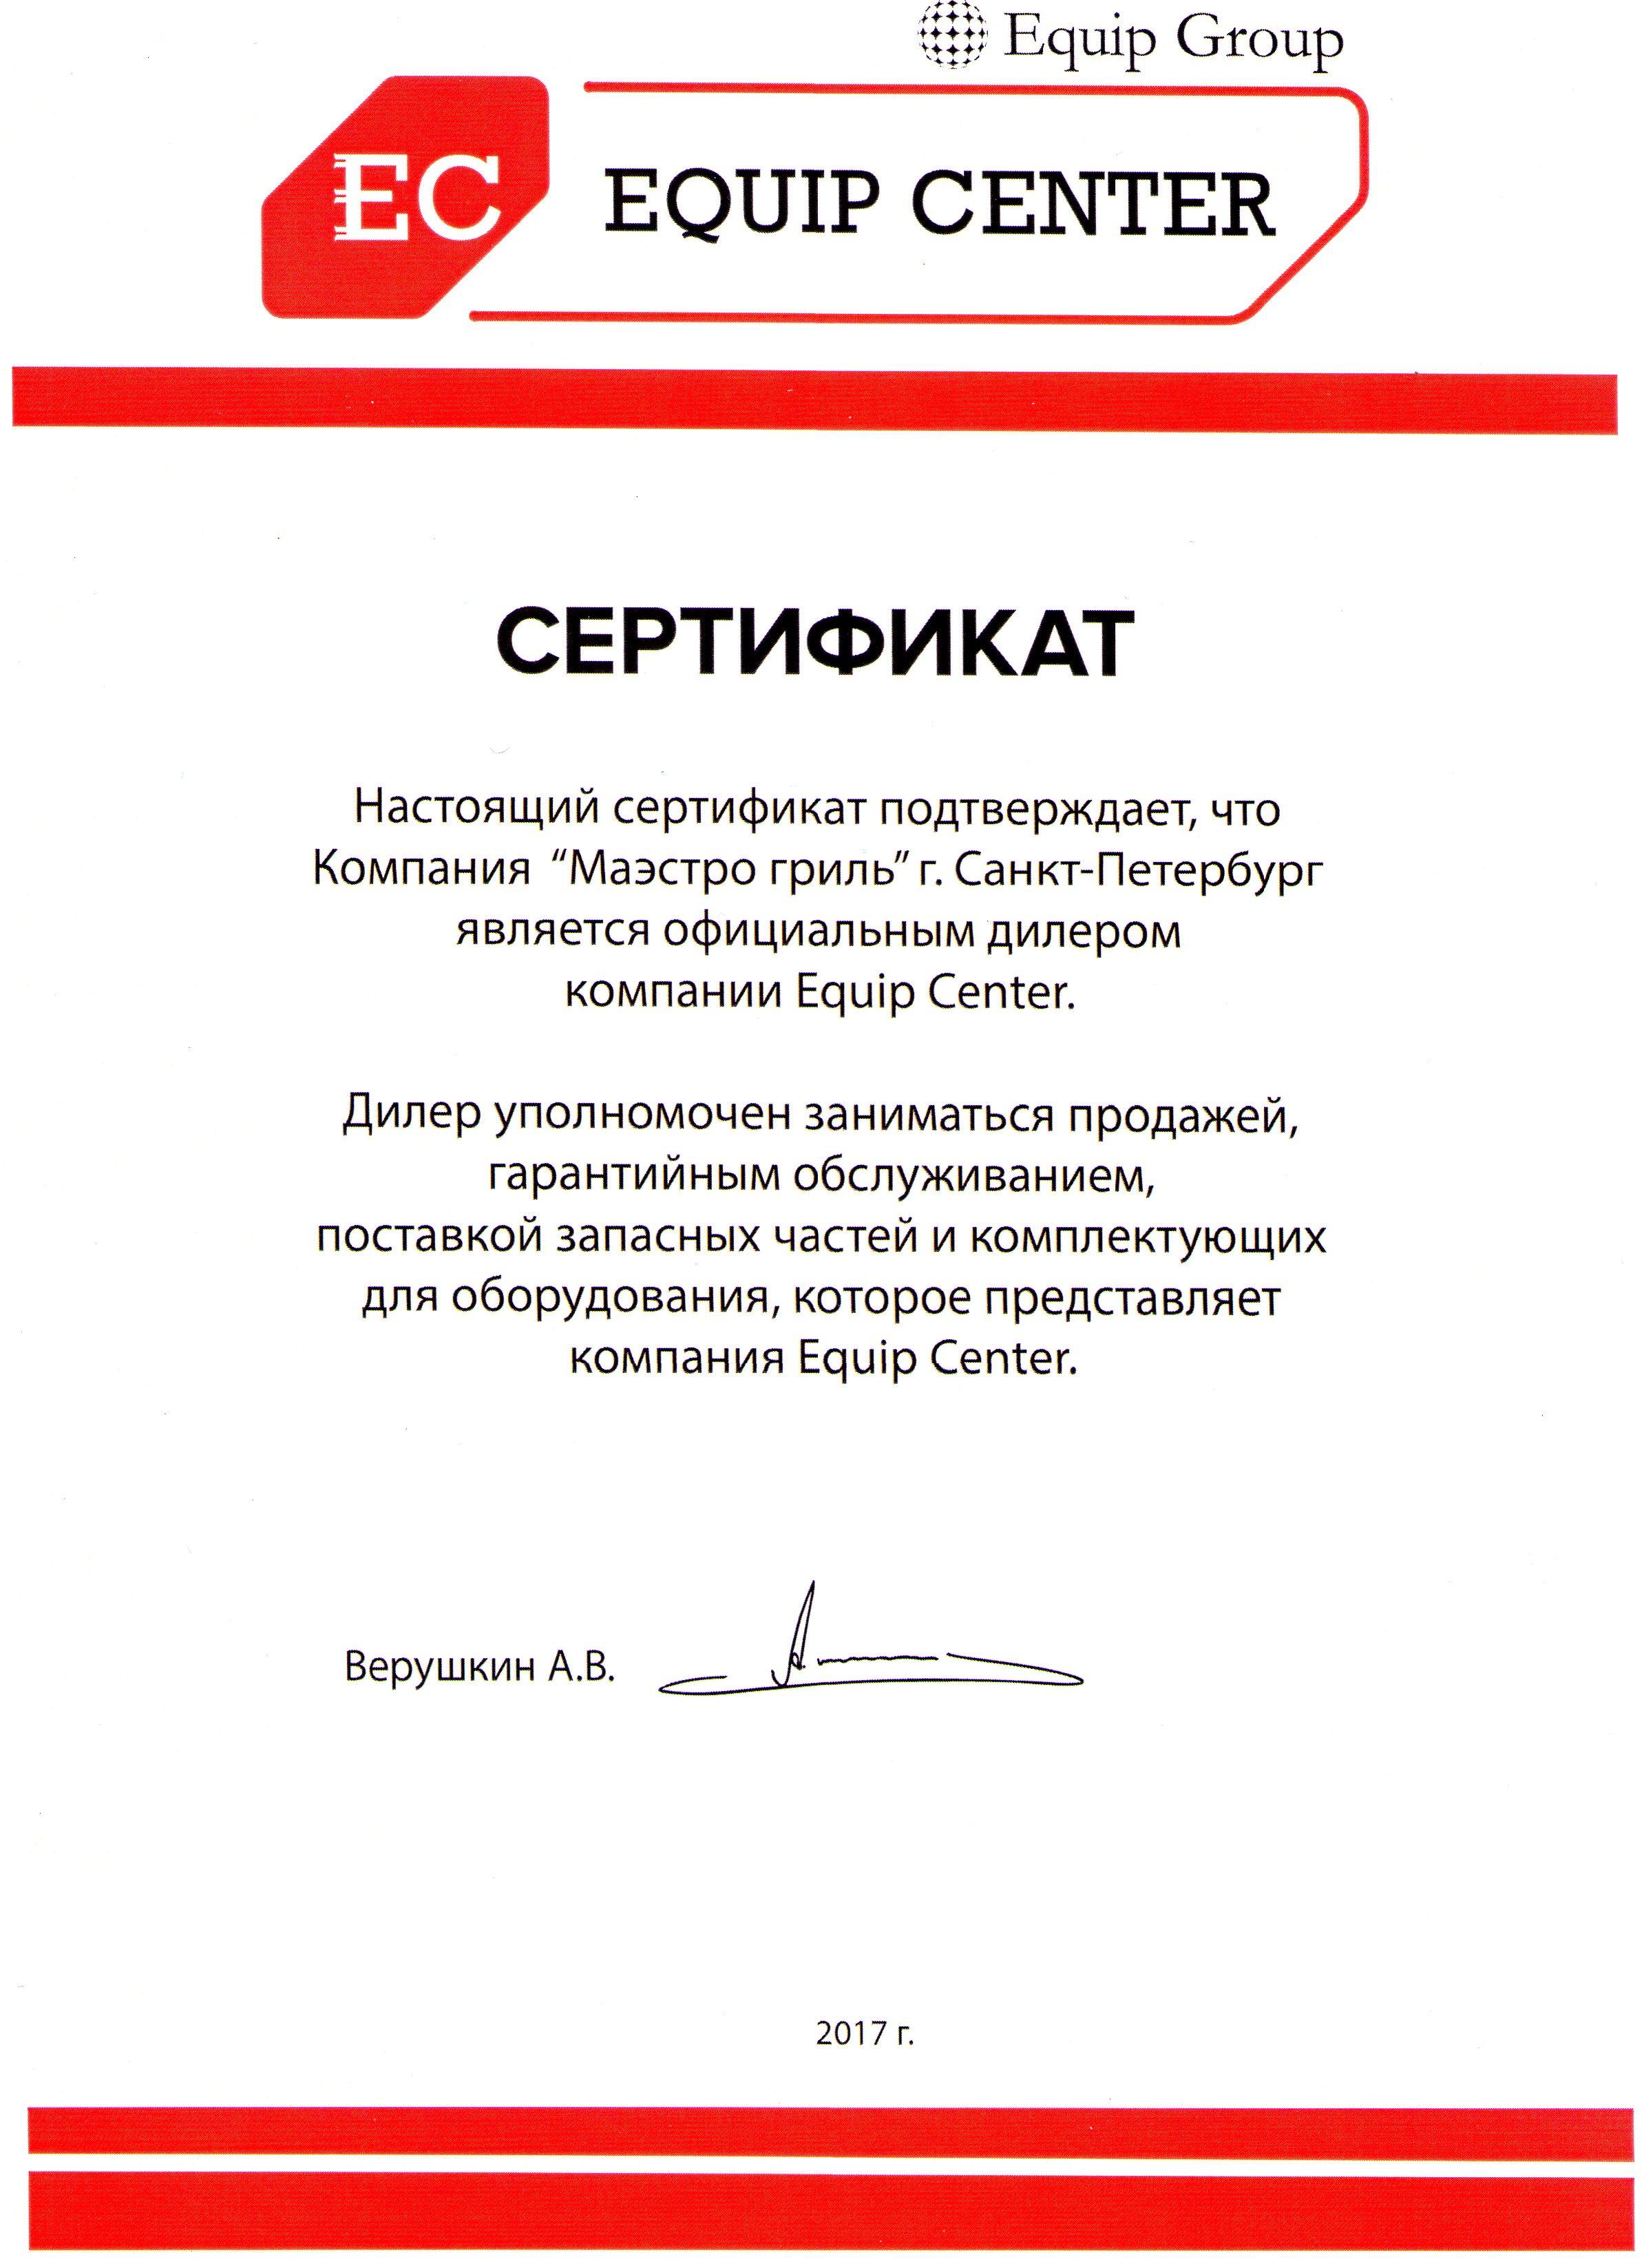 iEQUIP_CENTER_СЕРВИС.jpg